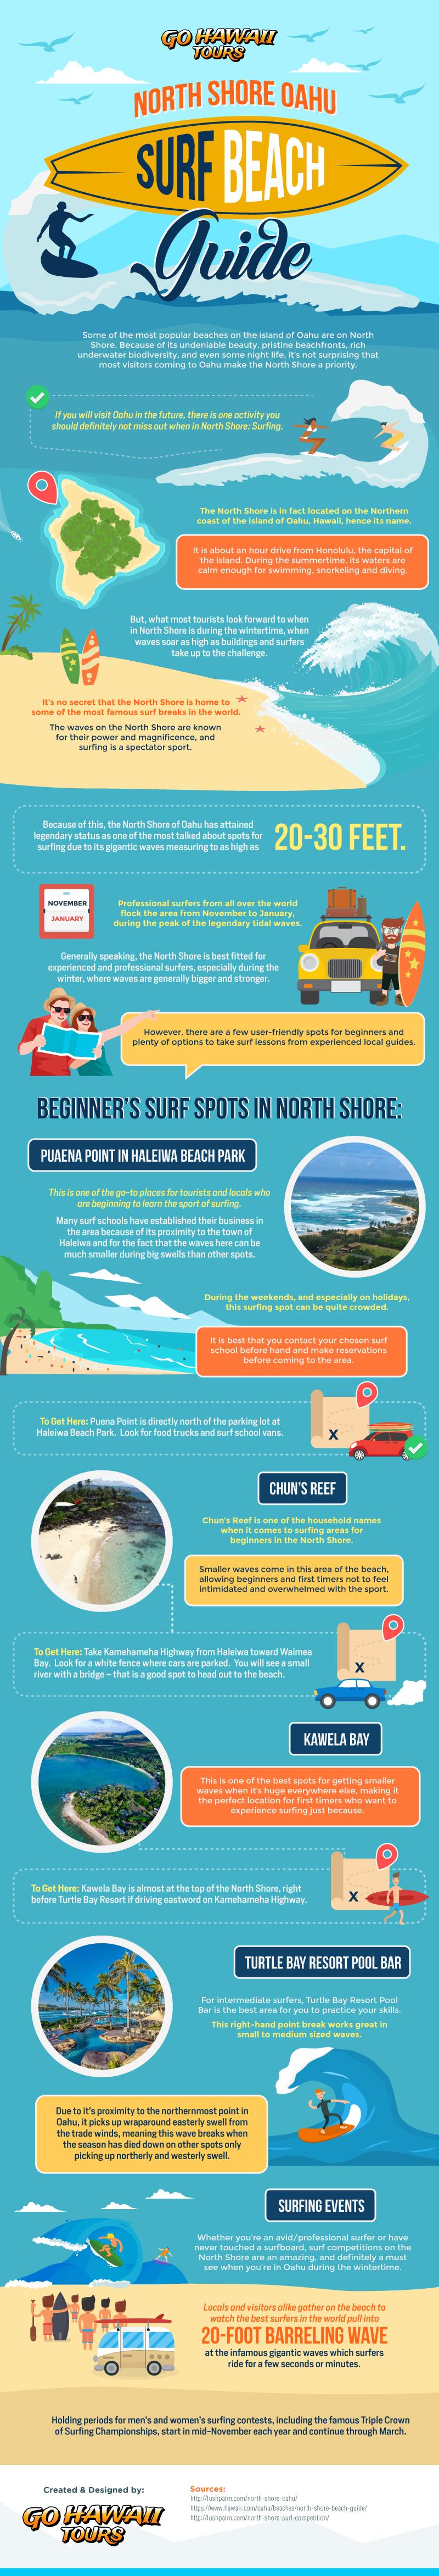 North Shore Oahu Surf Beach Guide